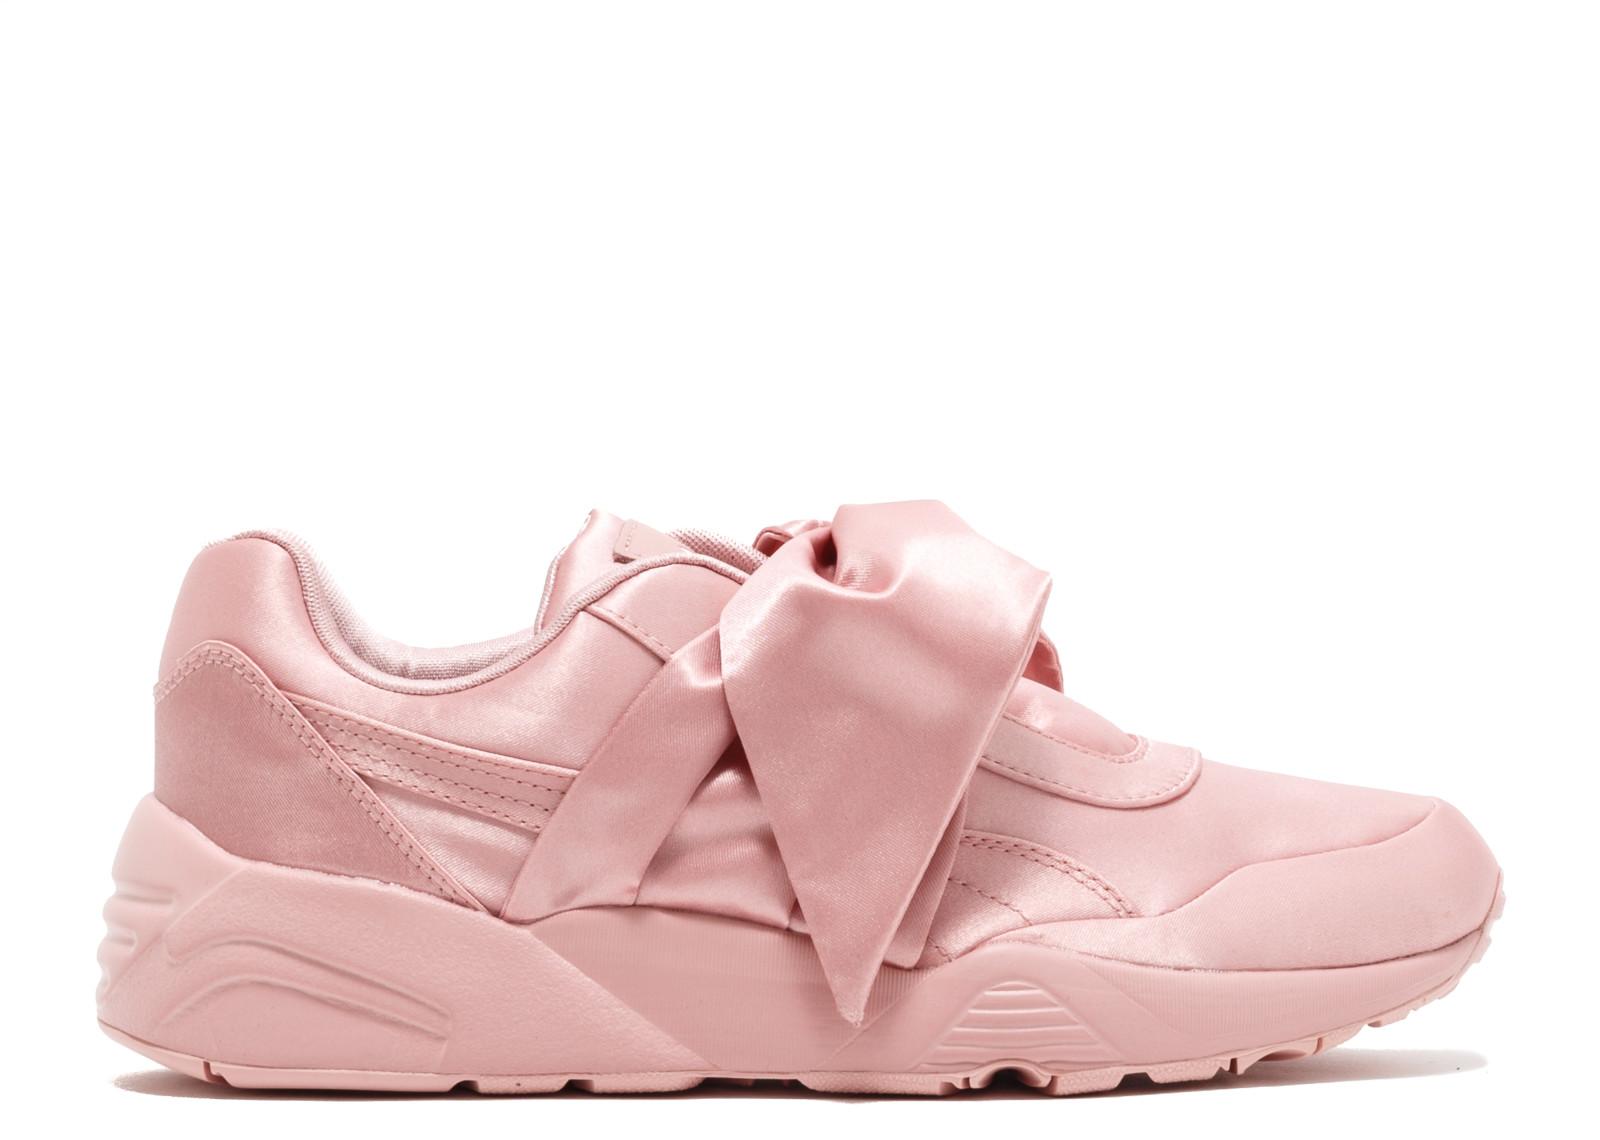 Puma x Fenty Rihanna Pink (36-40)